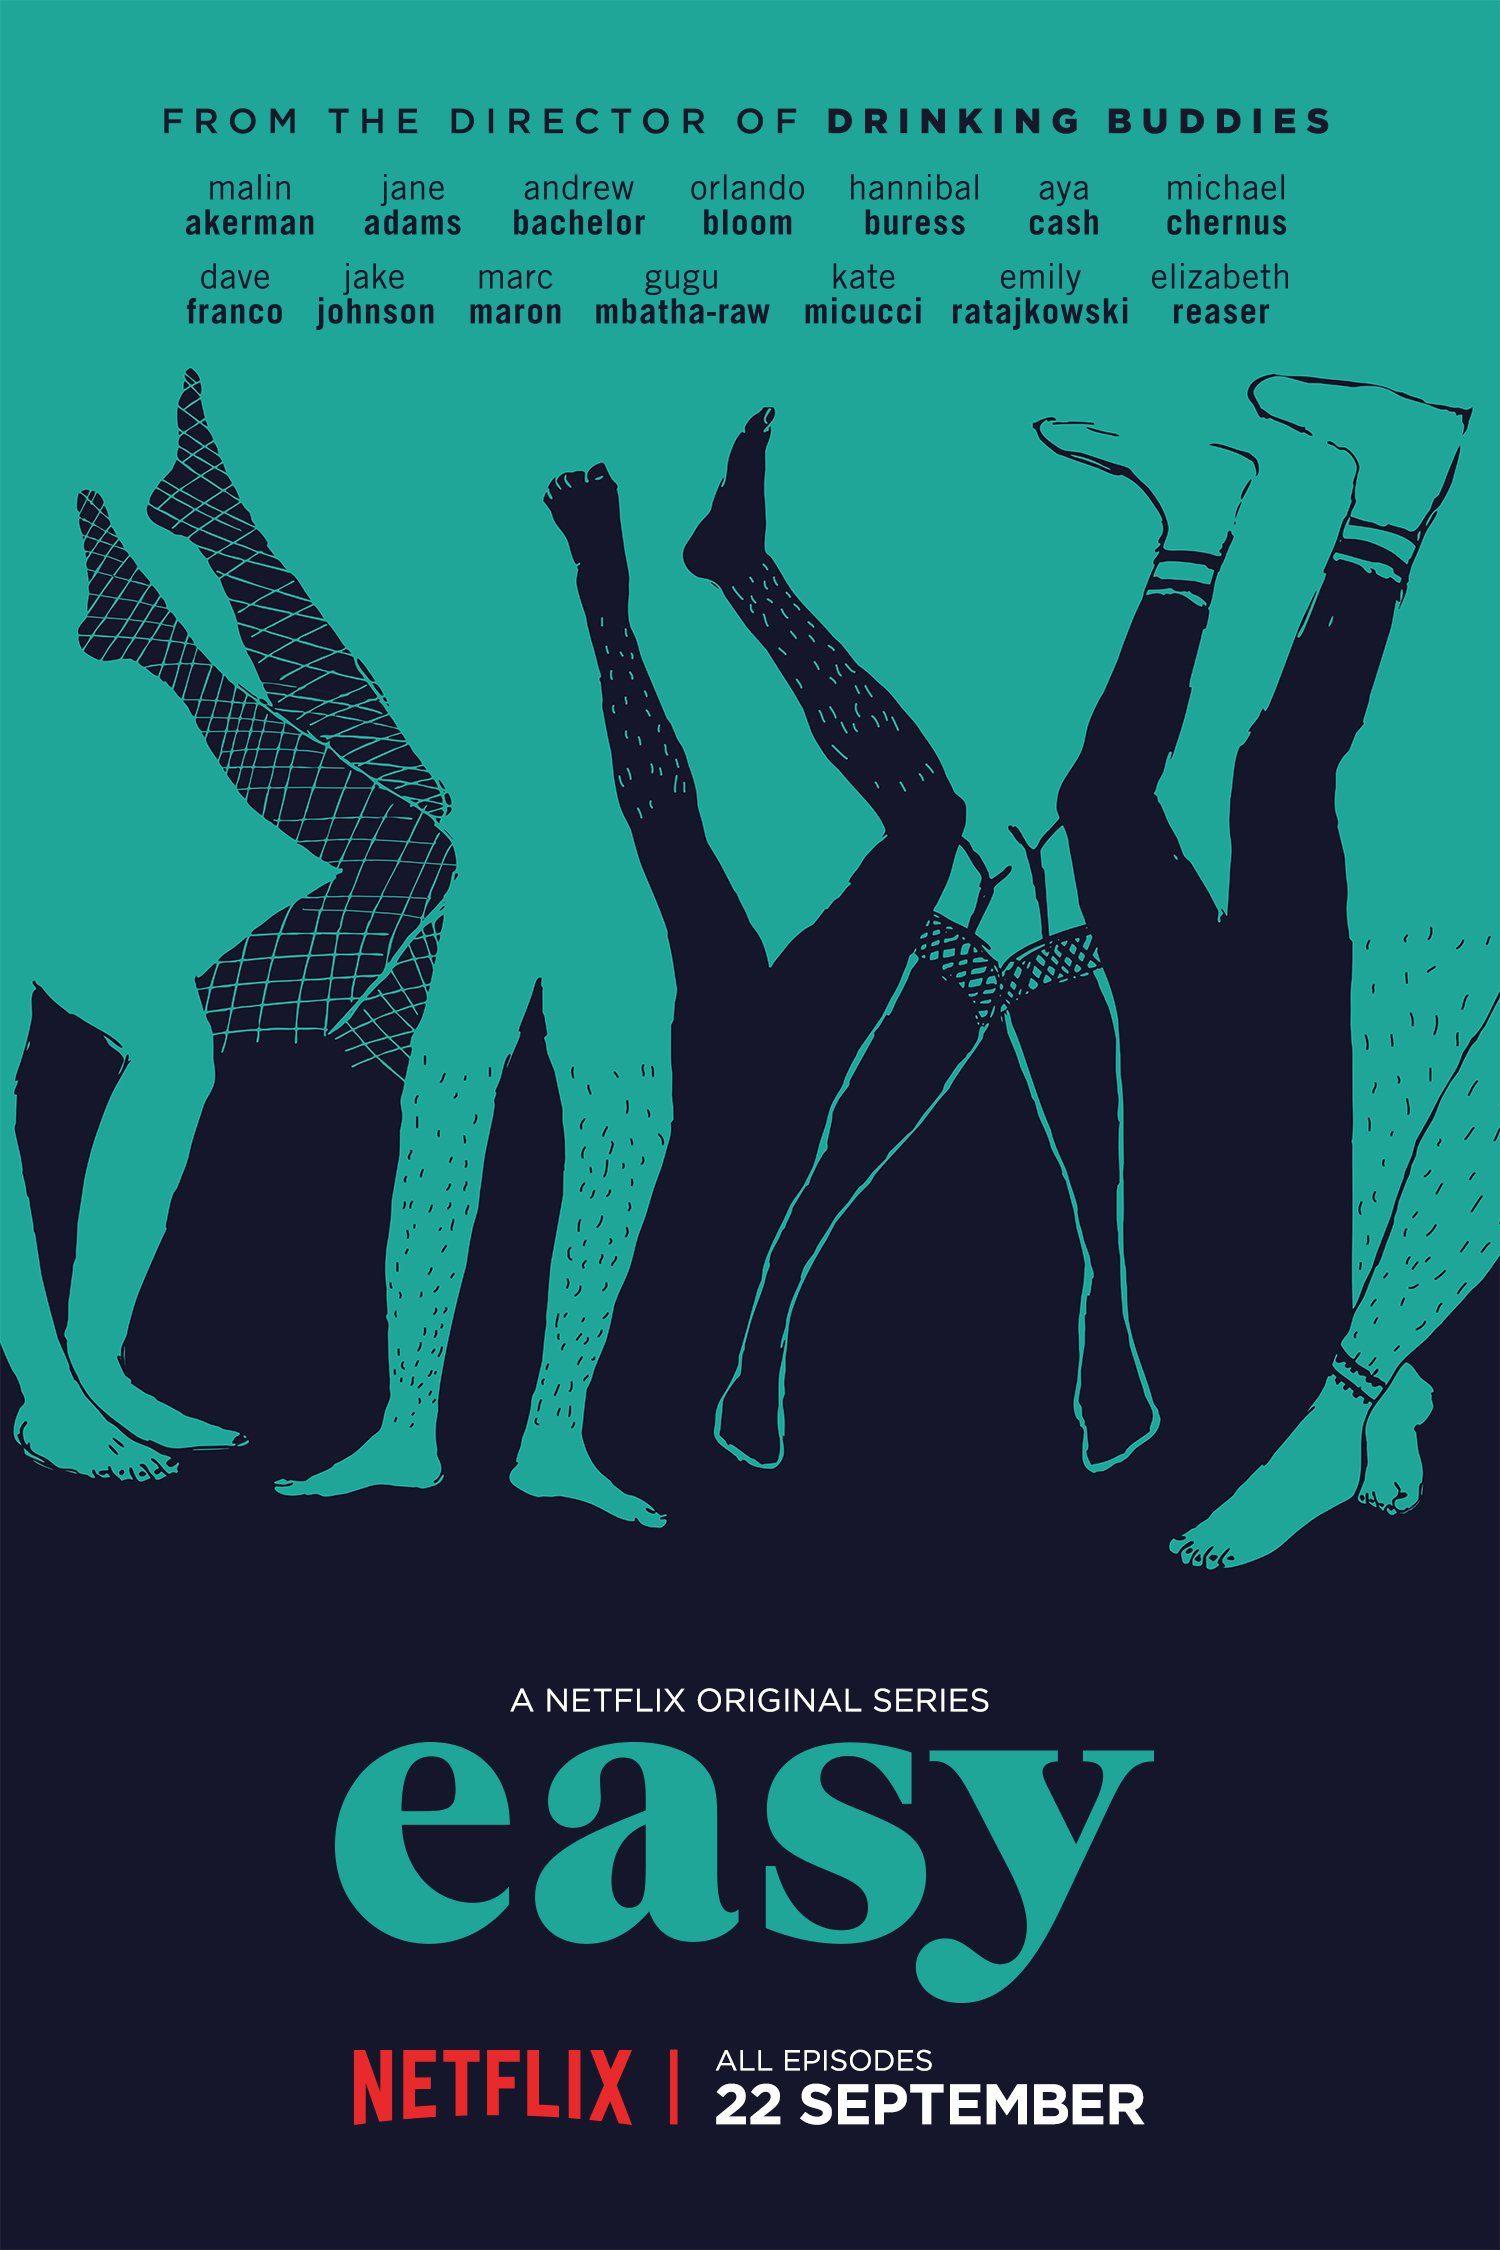 easy netflix poster franco dave maron marc trailer series collider reaser